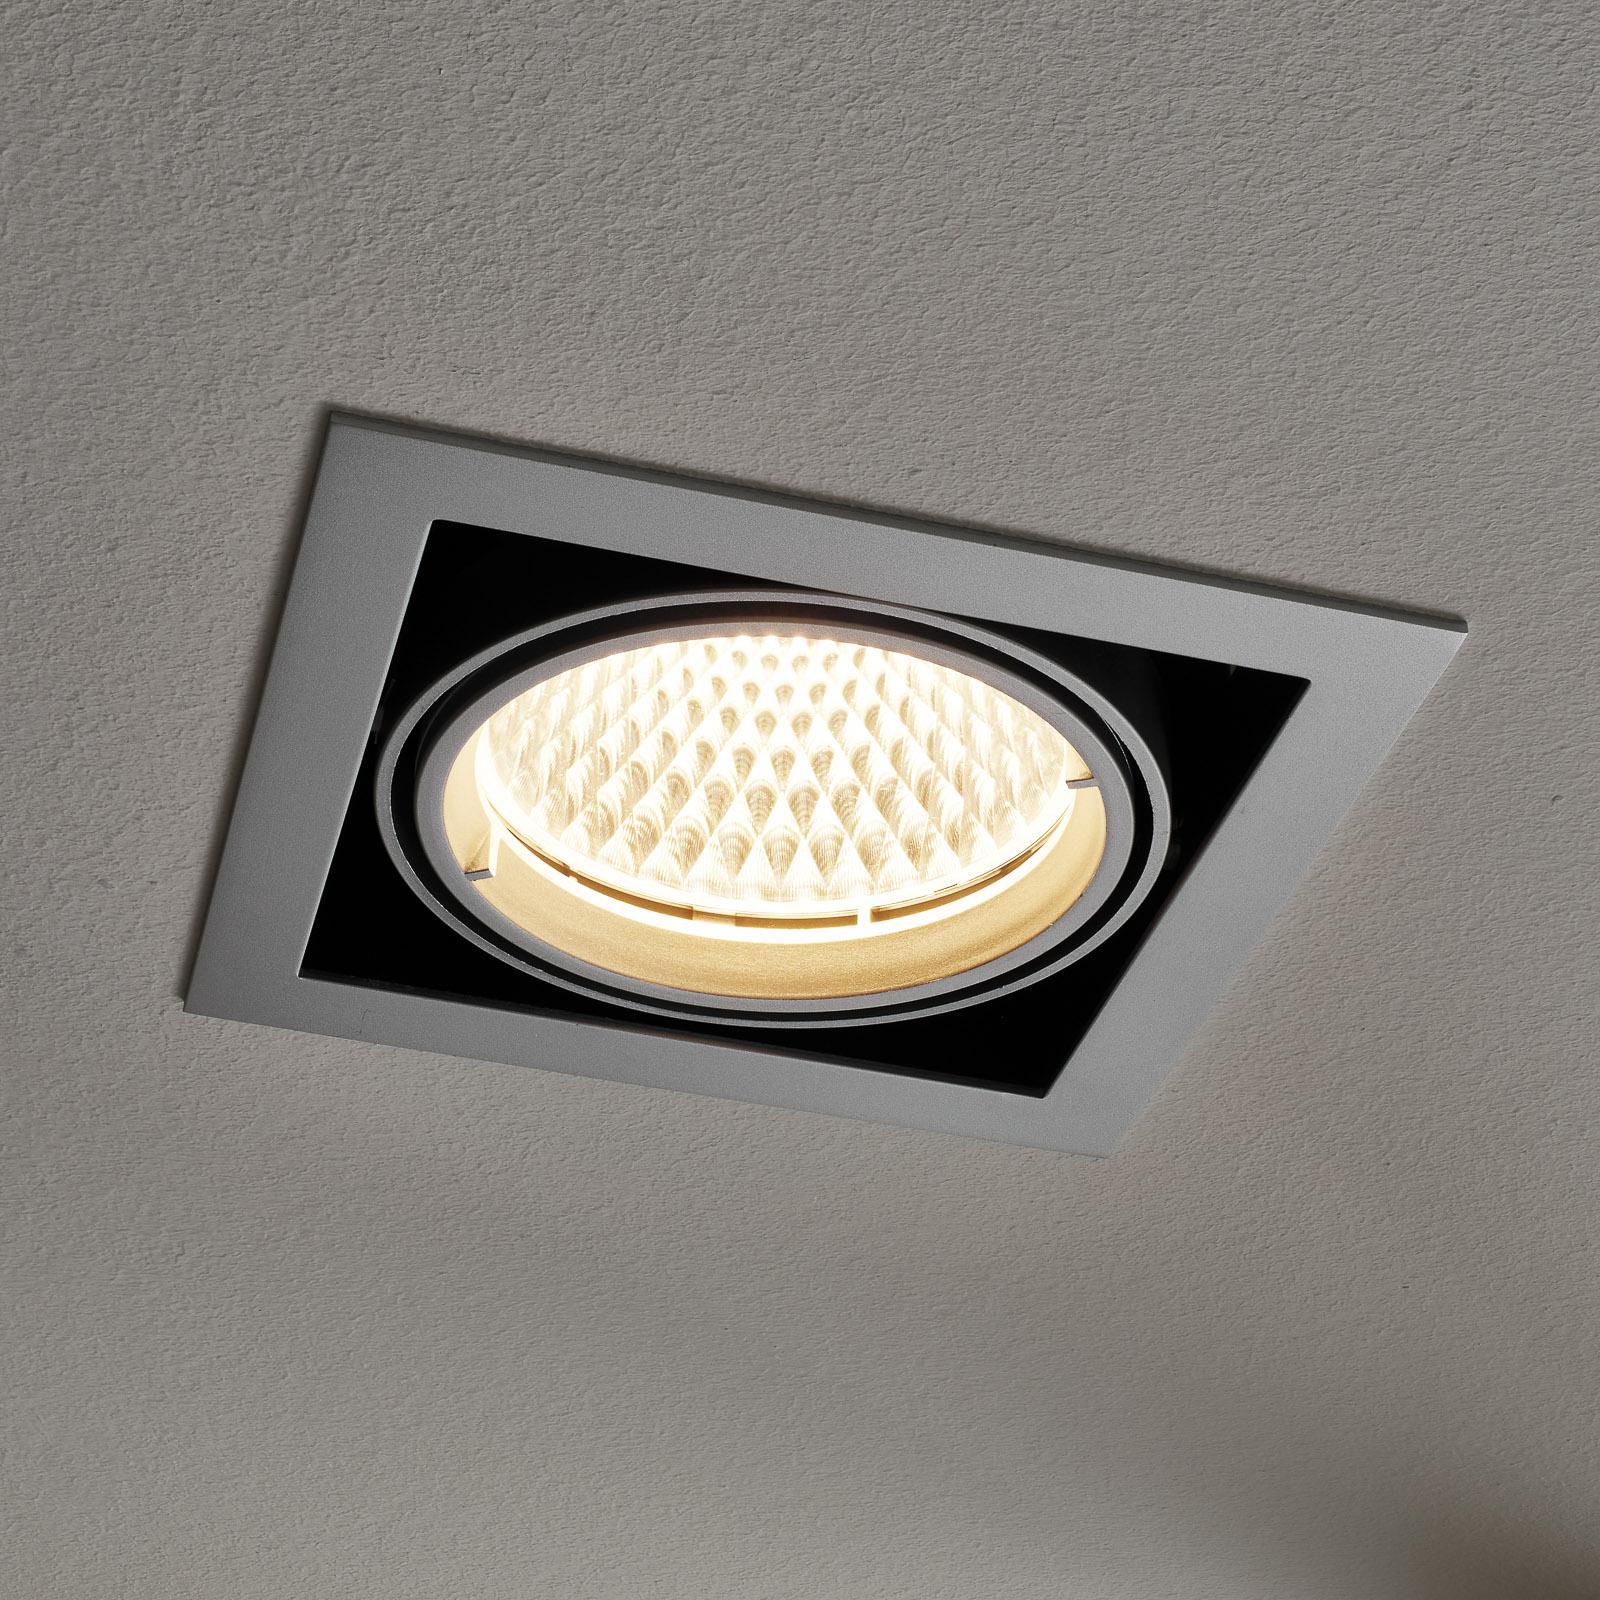 Arcchio Adin LED-Einbaulampe, 3.000K, 25,9W, grau